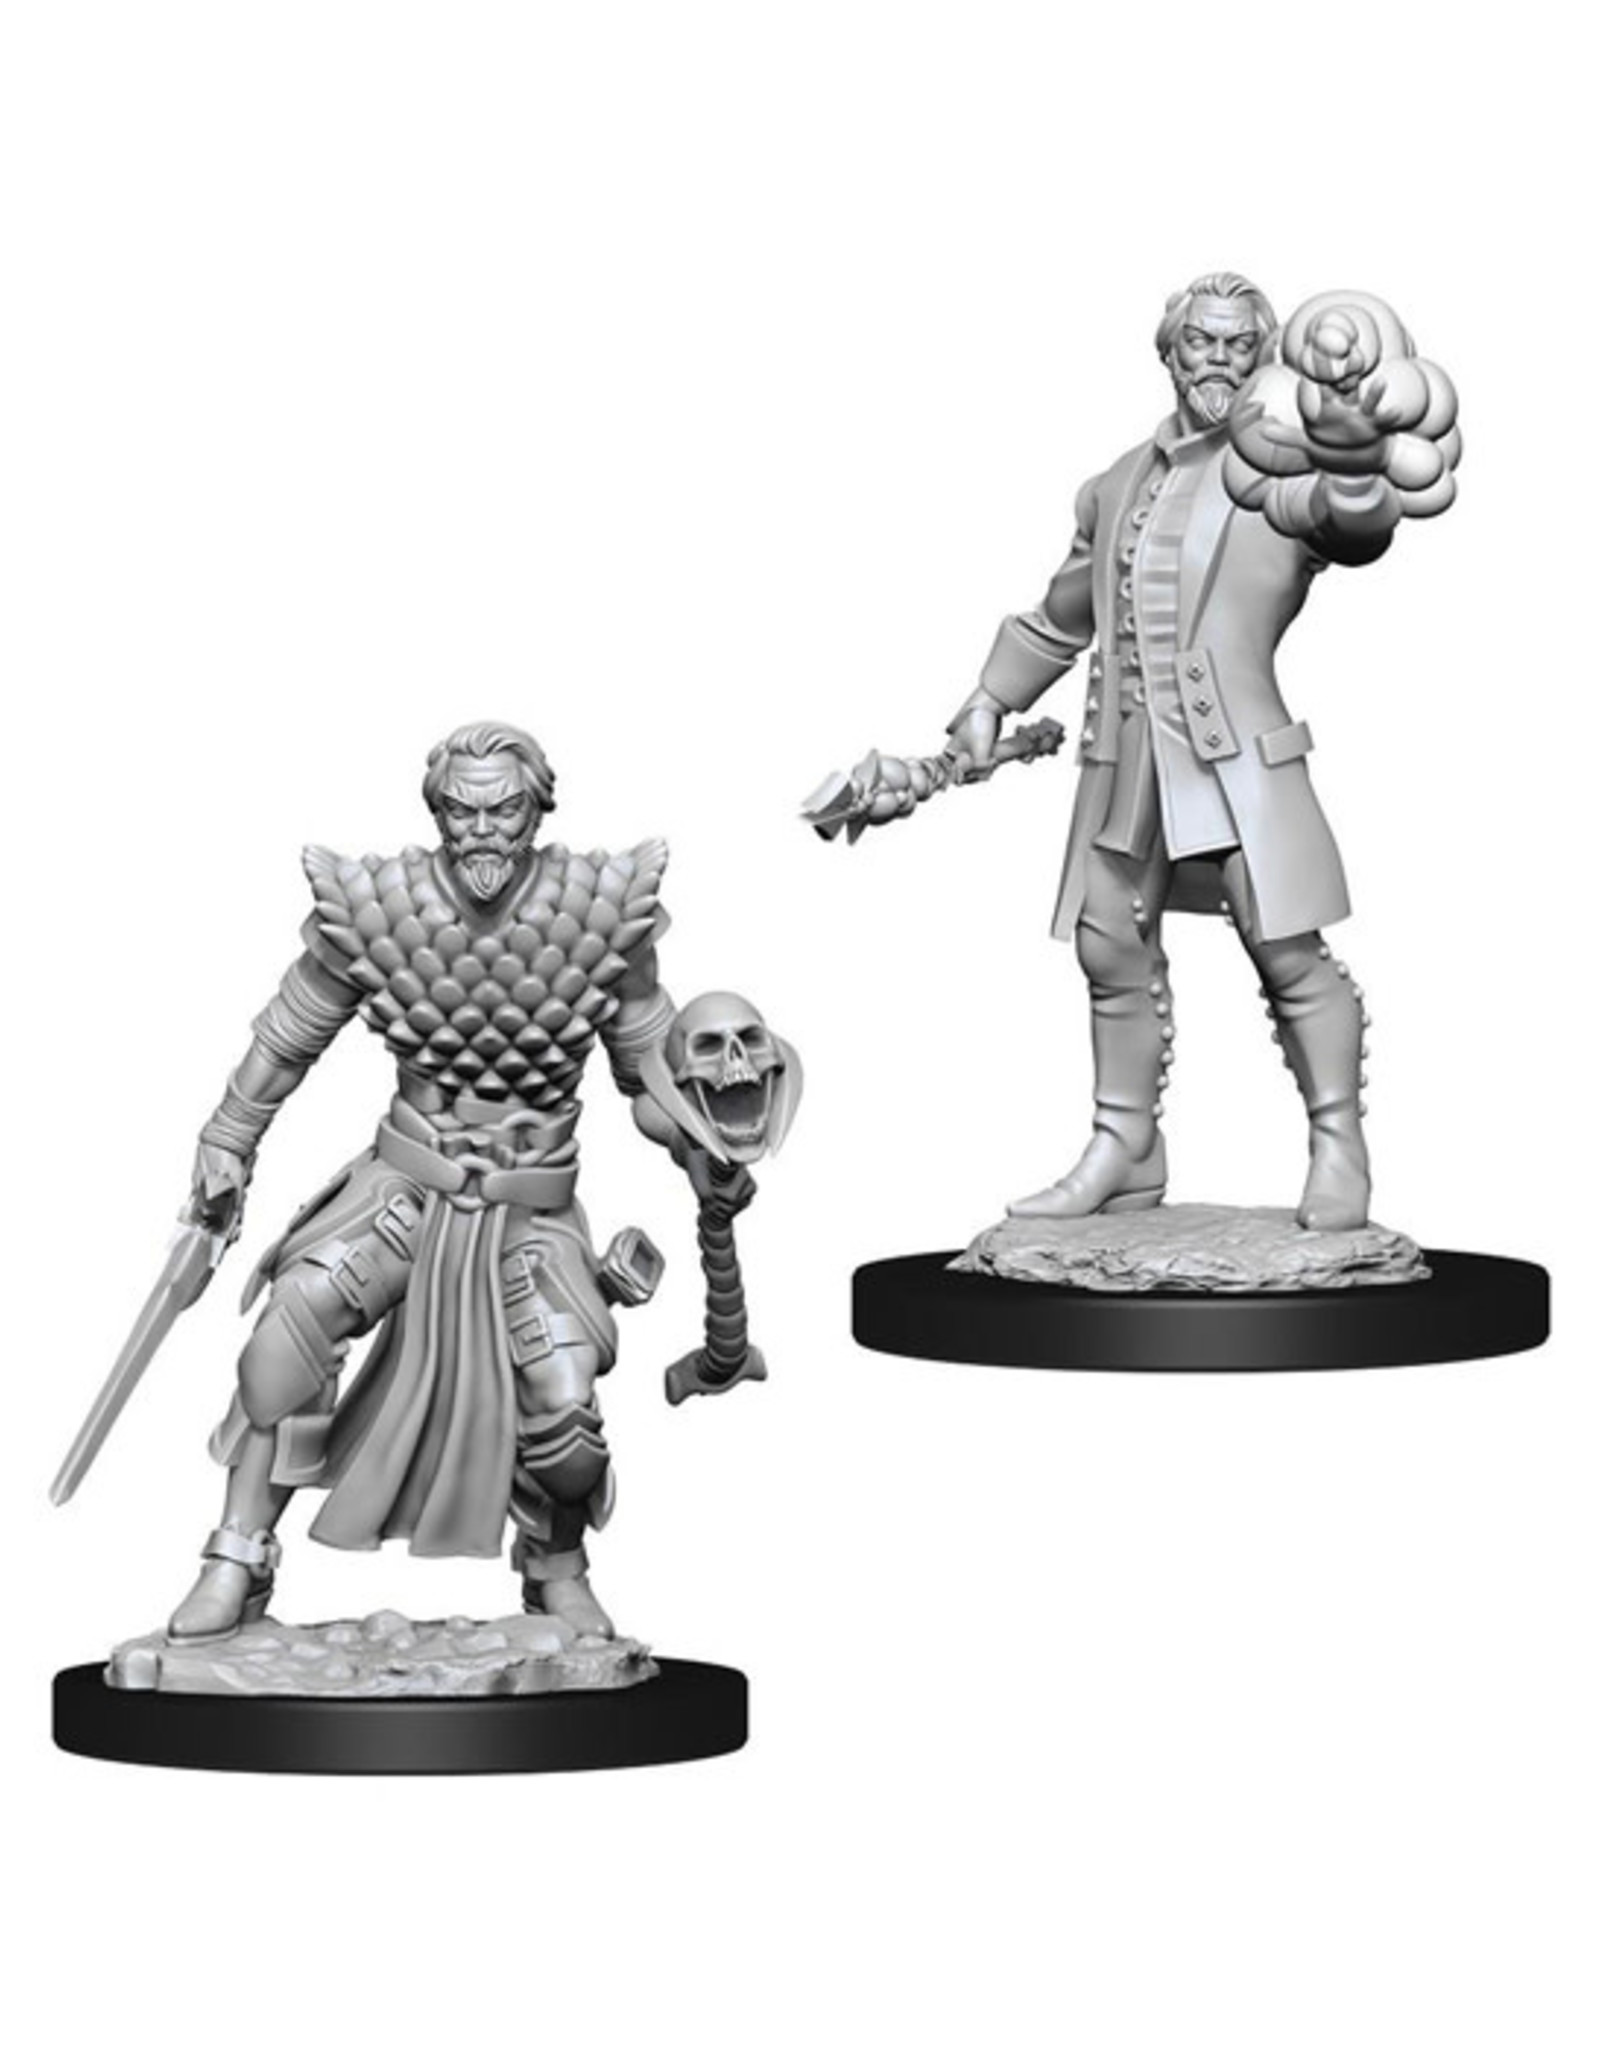 Dungeons & Dragons Dungeons & Dragons: Nolzur's - Human Male Warlock